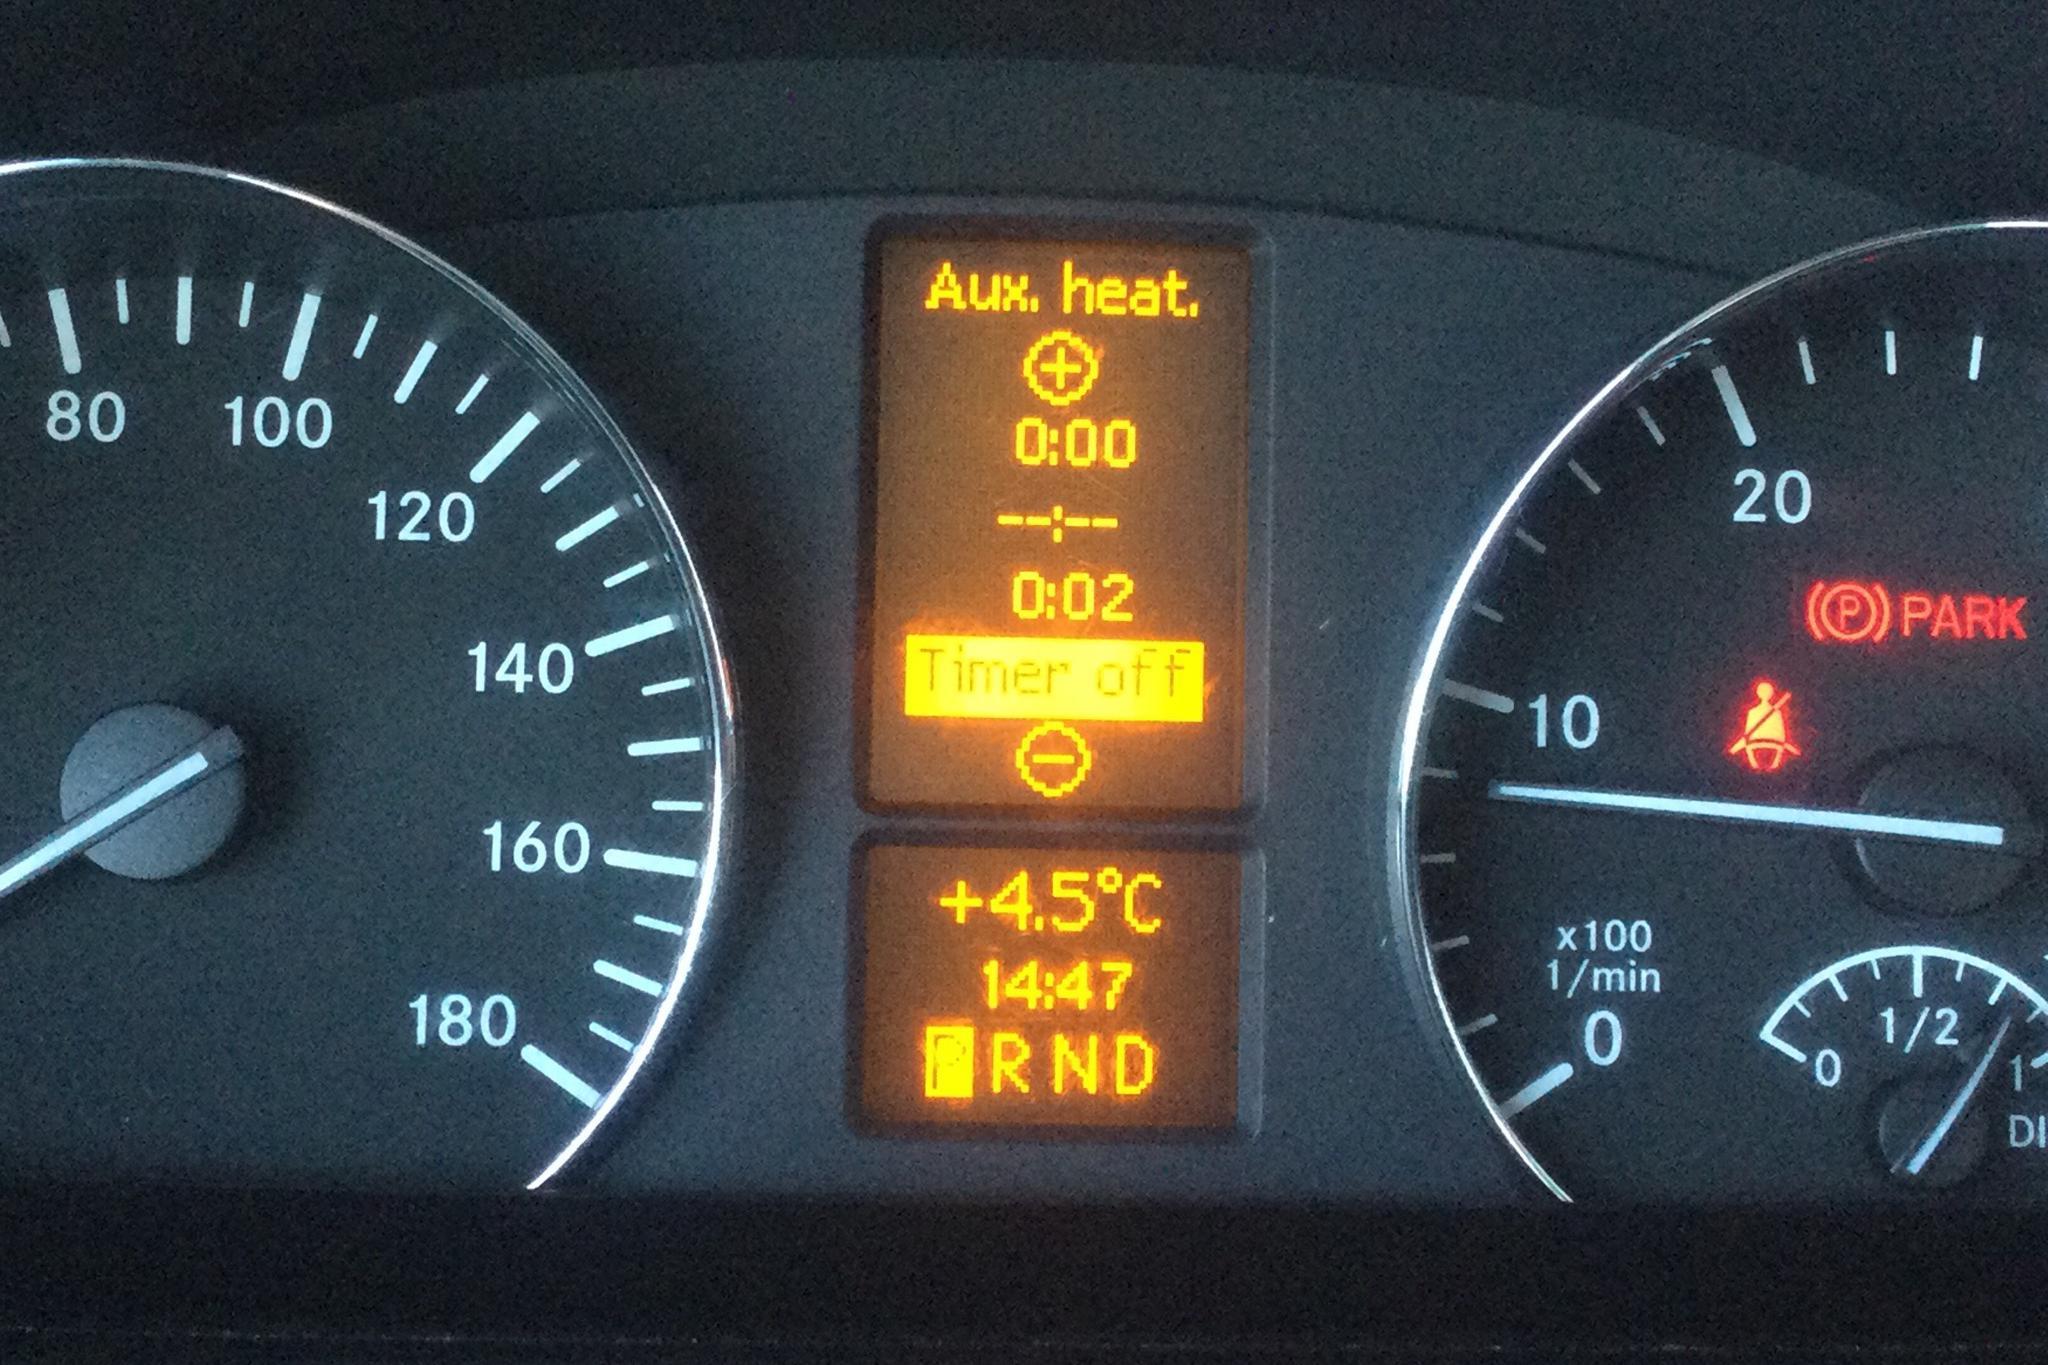 Mercedes Sprinter 316 CDI Pickup/Chassi (163hk) - 68 040 km - Automatic - white - 2016